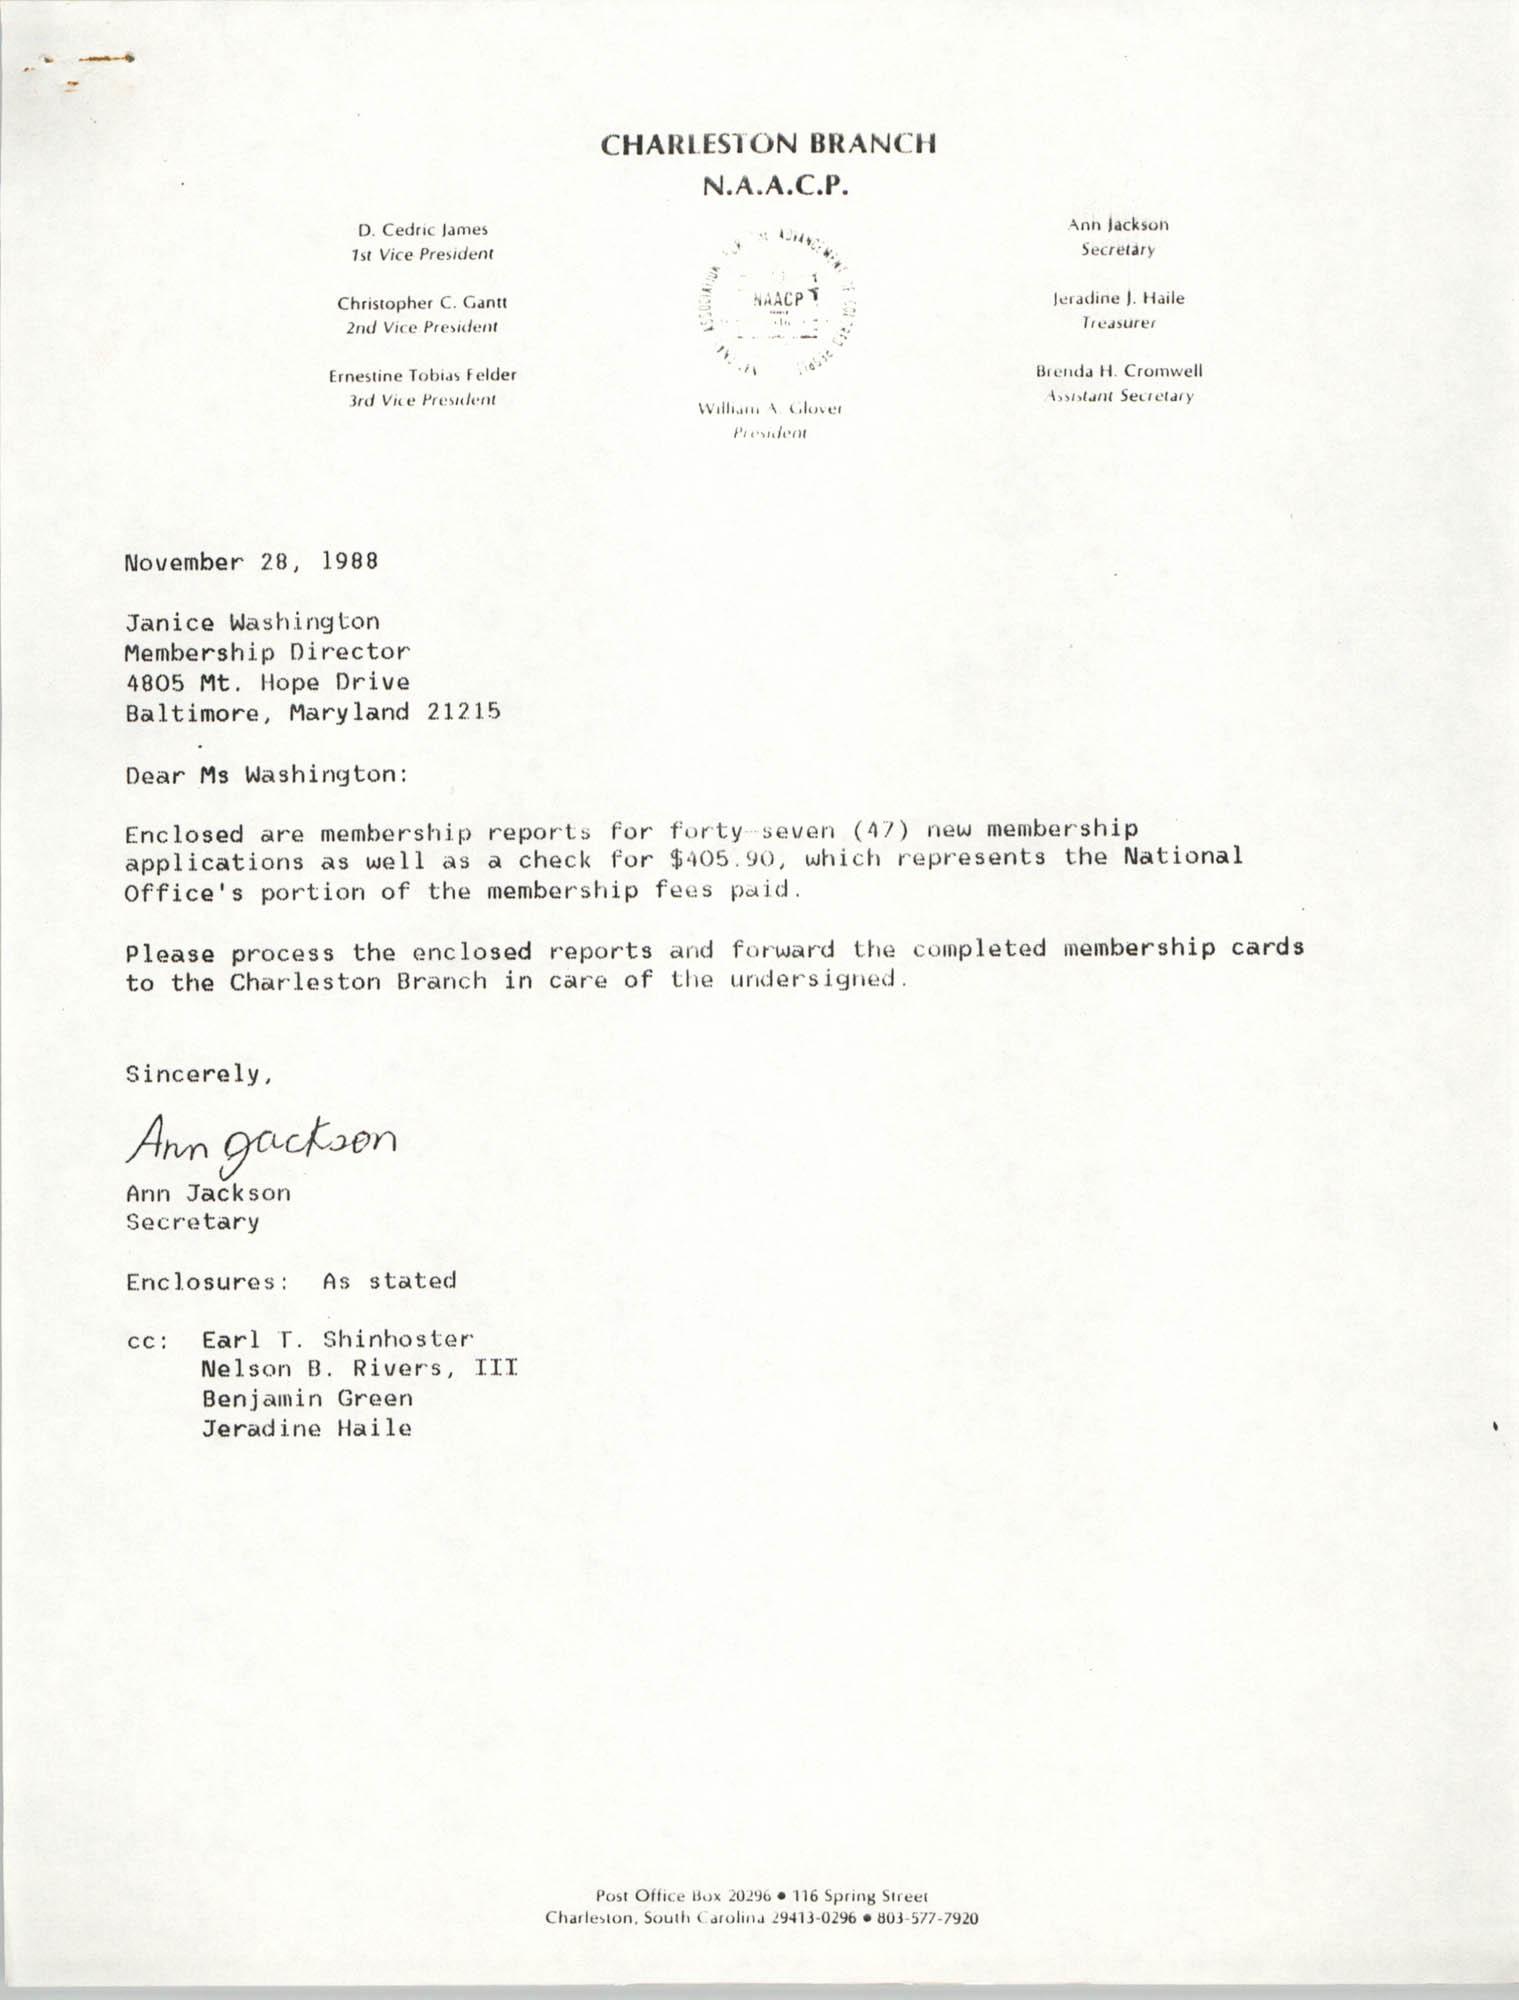 Letter from Ann Jackson to Janice Washington, NAACP, November 28, 1988